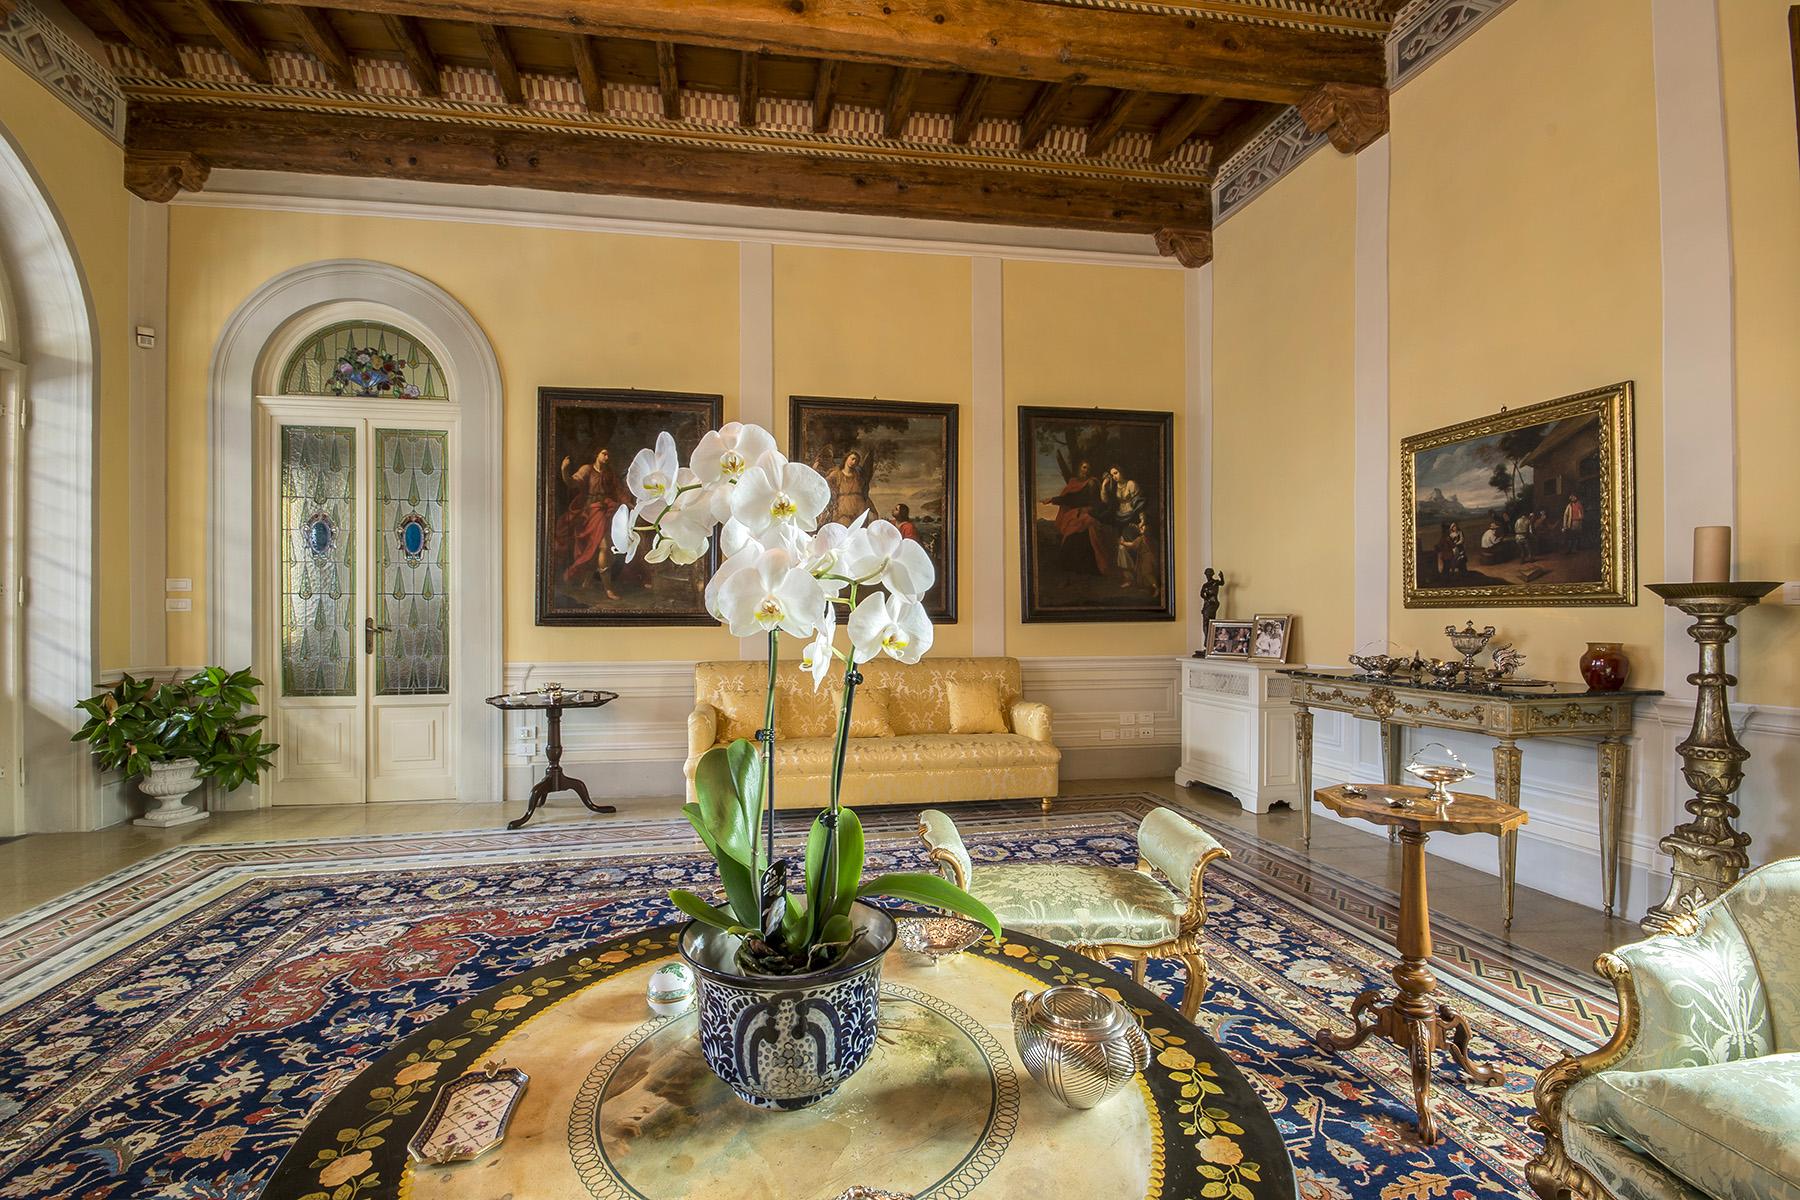 Villa in Vendita a Lucca: 5 locali, 1200 mq - Foto 3